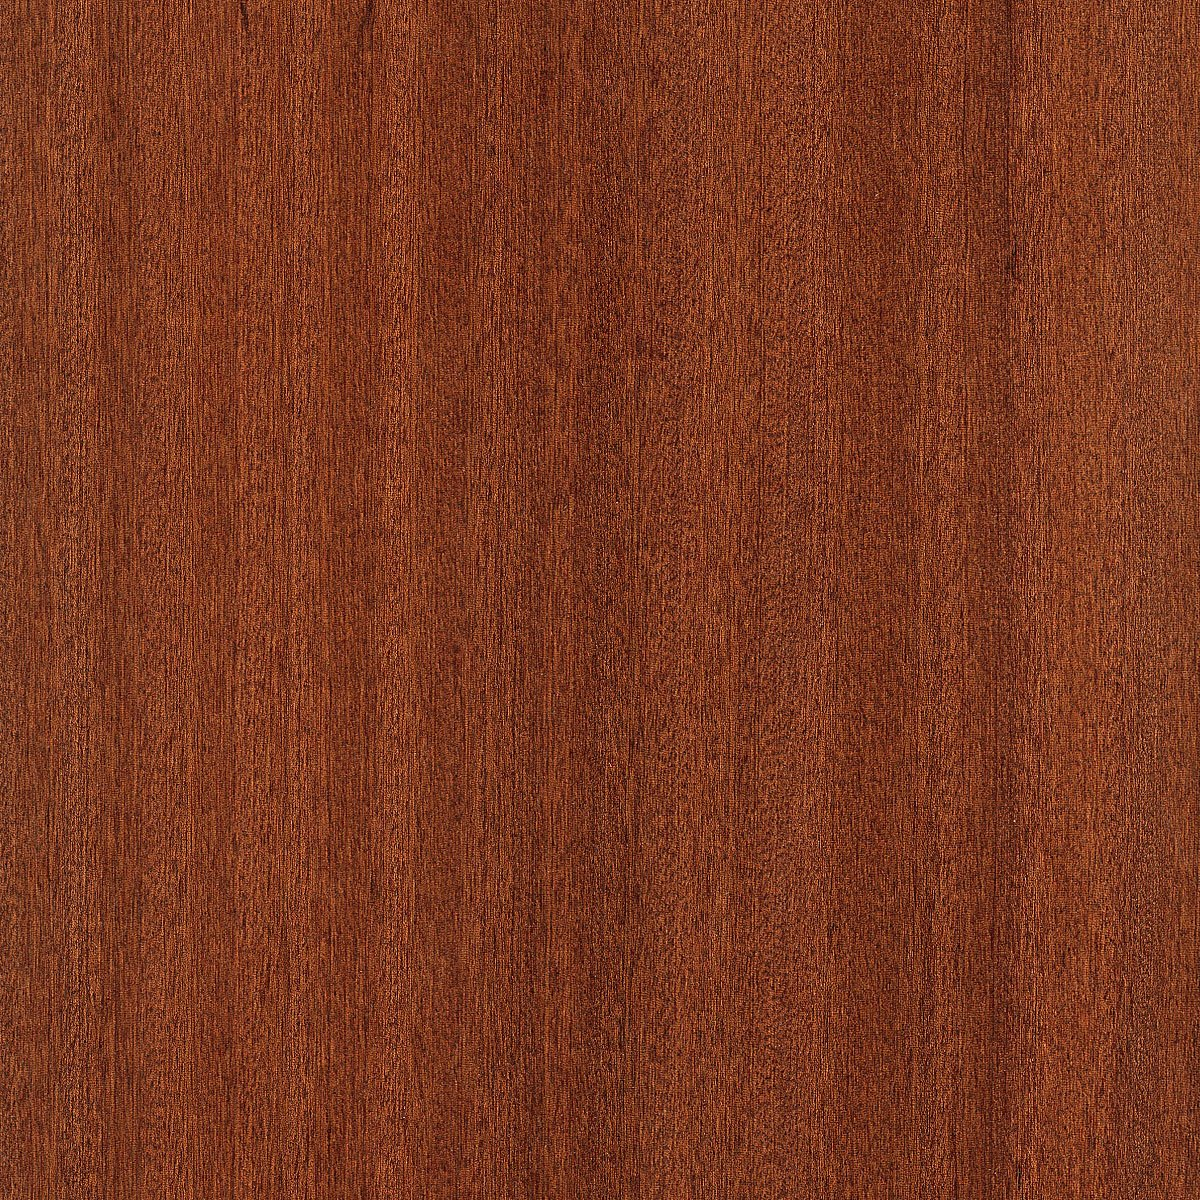 Sapele Wood Veneer Qtr Cut Ribbon 4x8 NBL(Woodback) Sheet